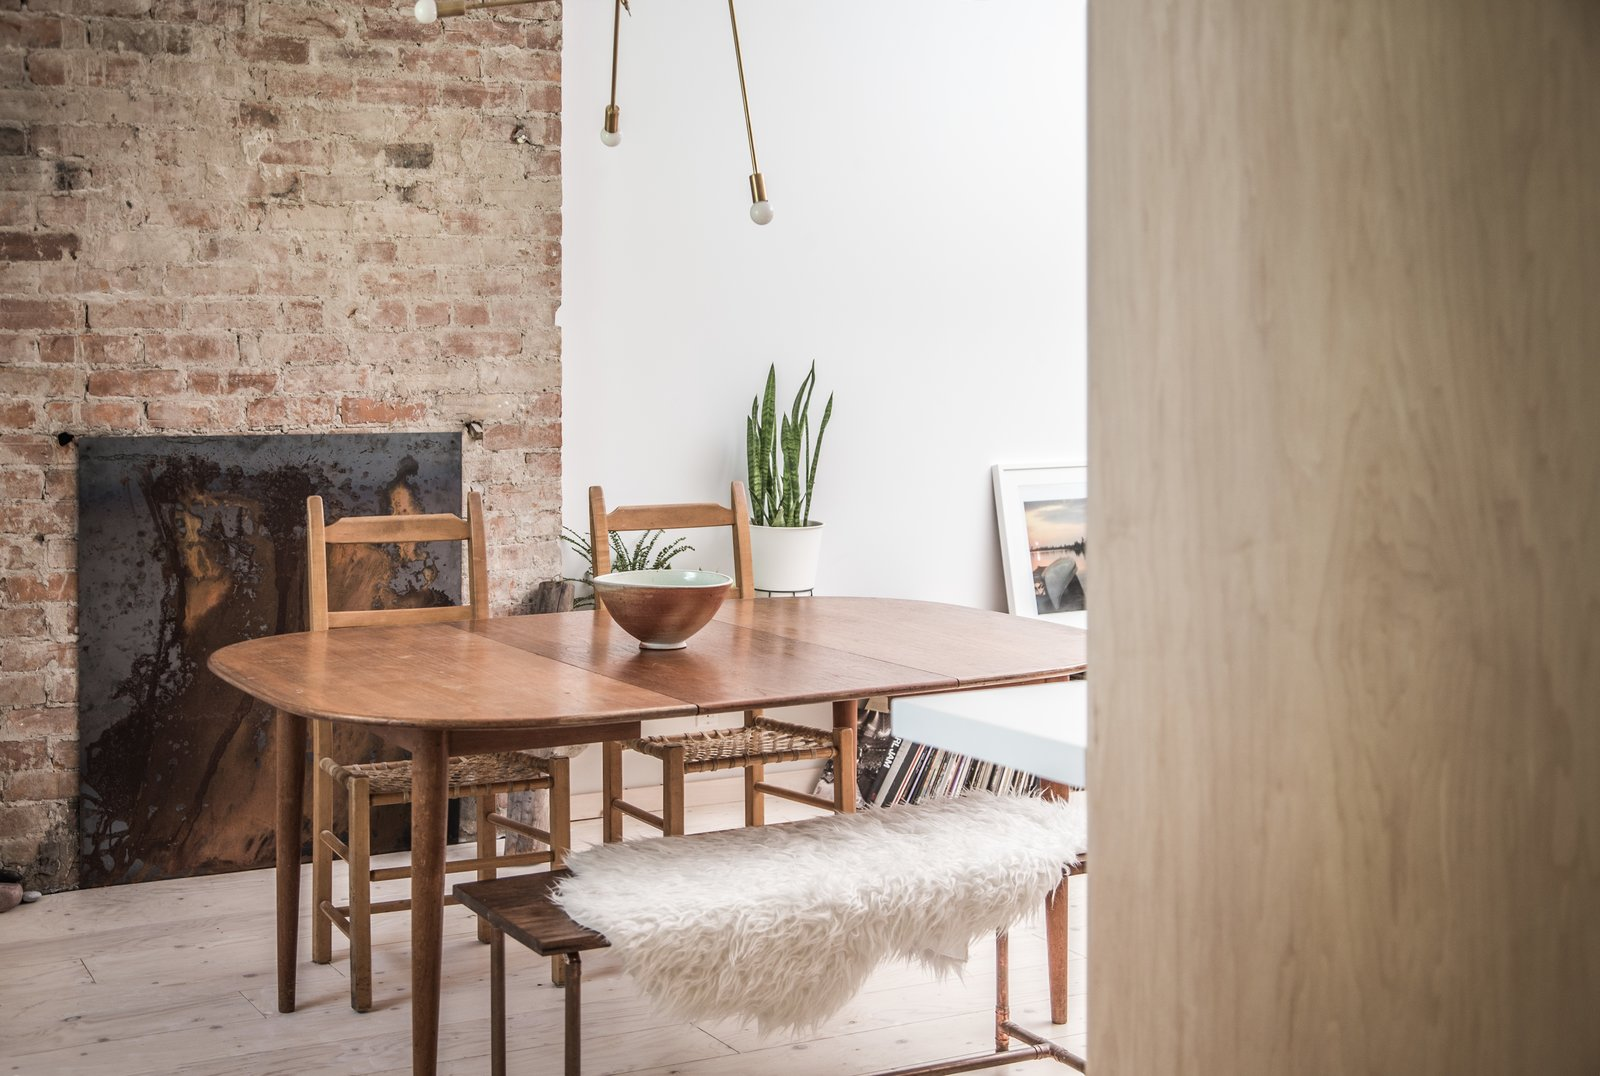 Dining Room, Bench, Chair, Table, Light Hardwood Floor, and Pendant Lighting  Sheridan Residence